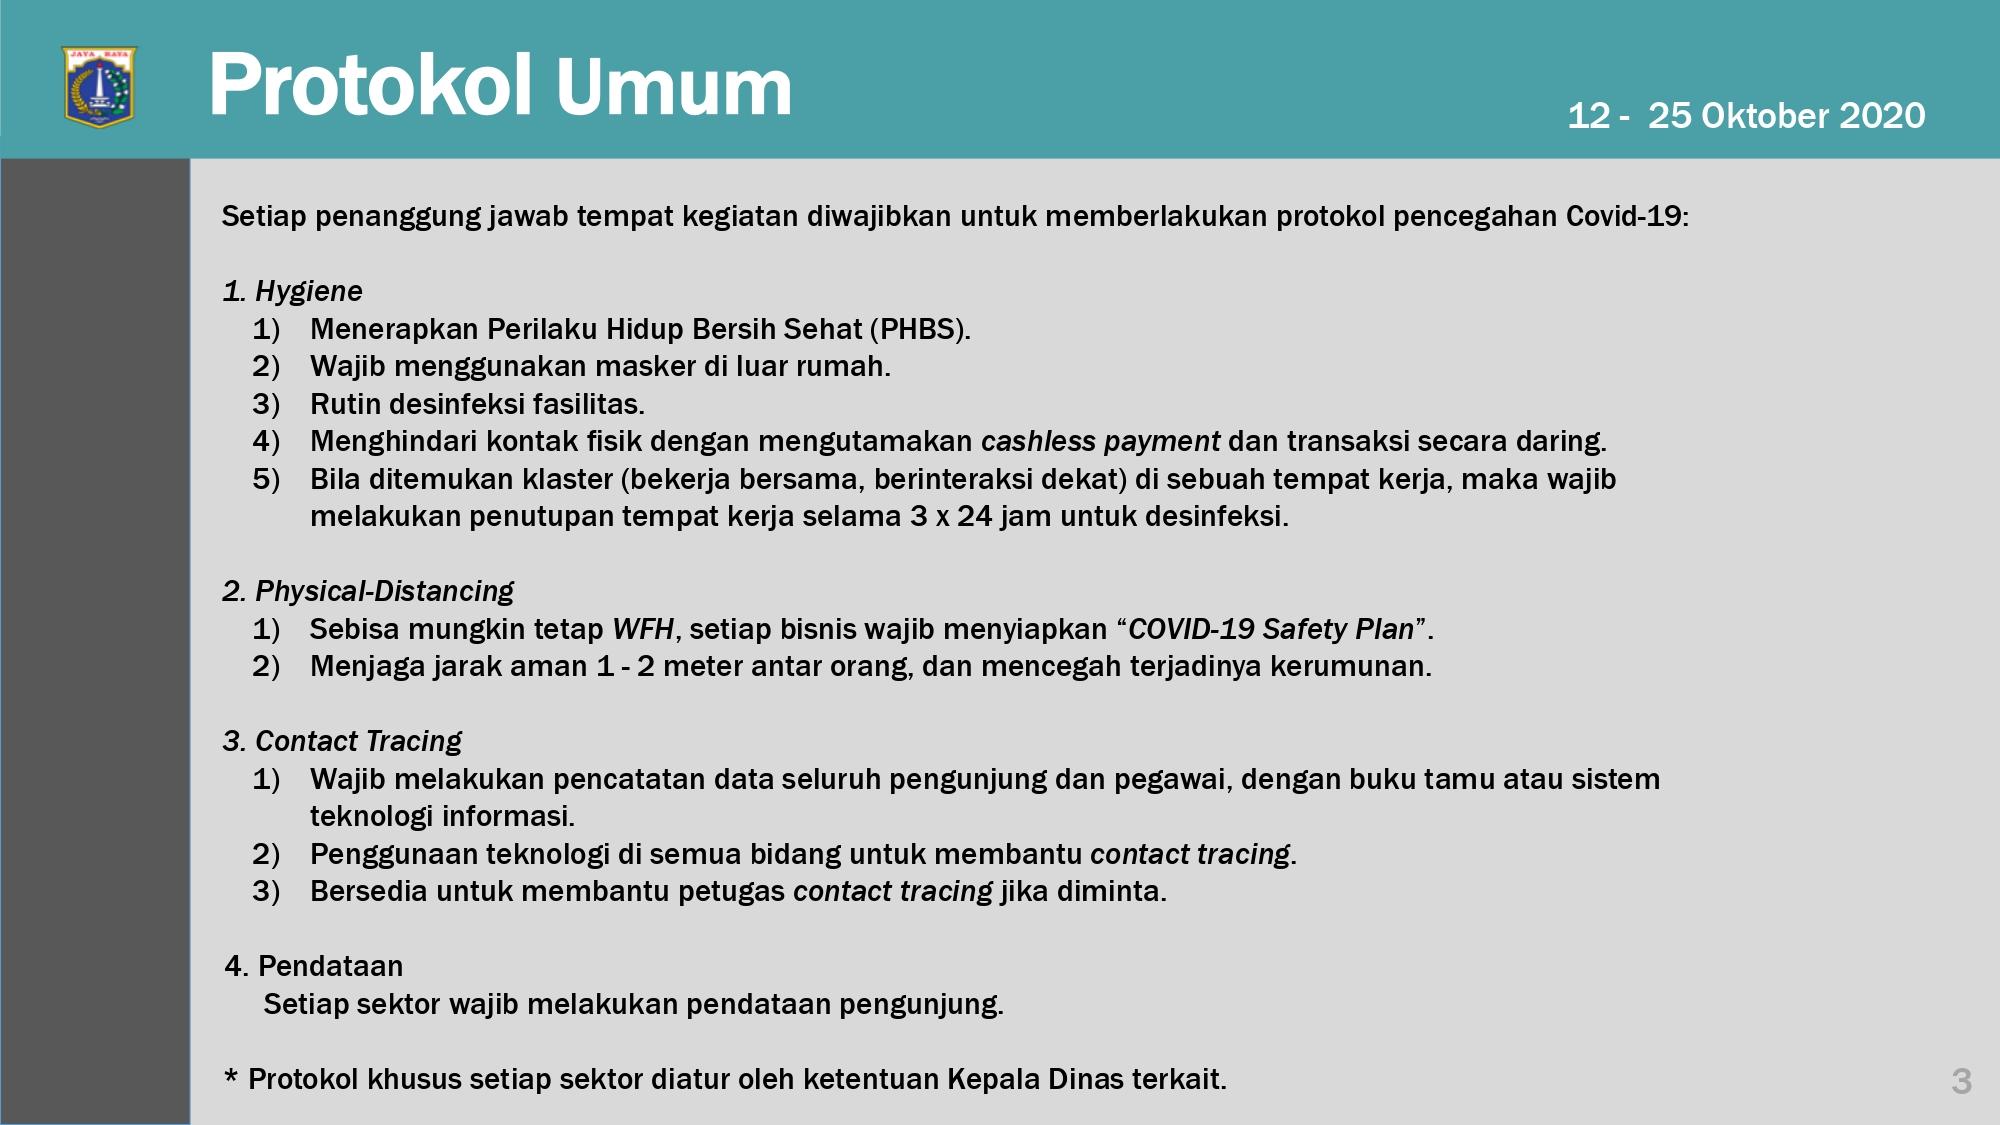 Pengaturan PSBB Transisi DKI Jakarta 12-25 Oktober 2020_page-0003